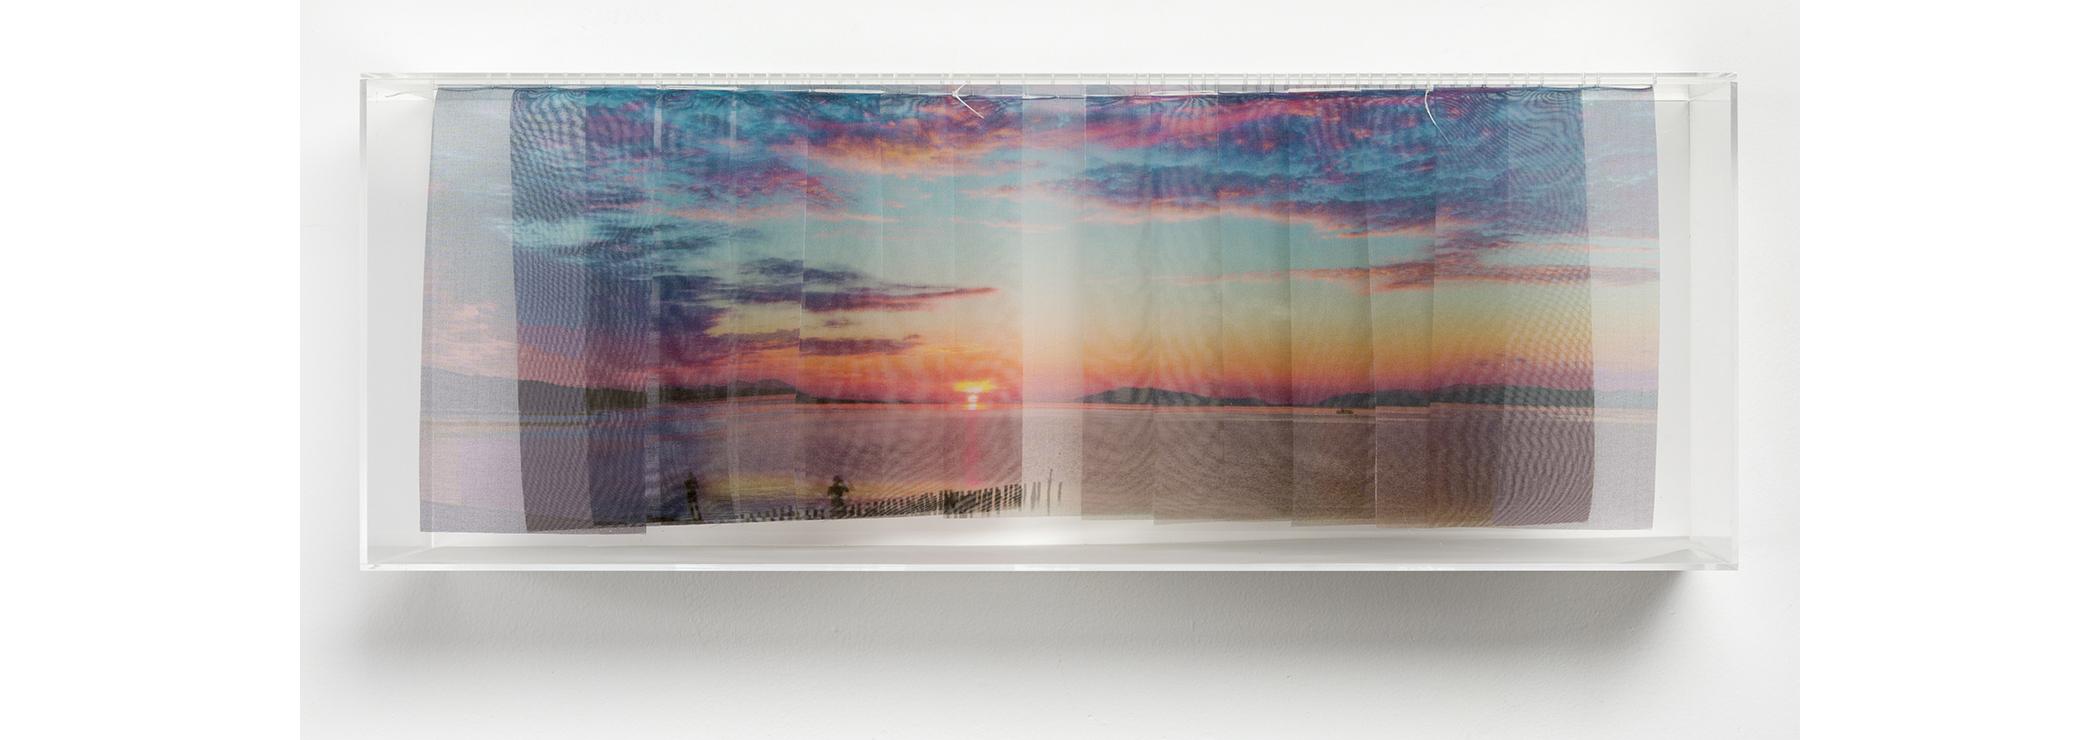 Crone_Shimane Sunset_8.75%22h x 24%22w x 5.5%22d_$3000.jpg